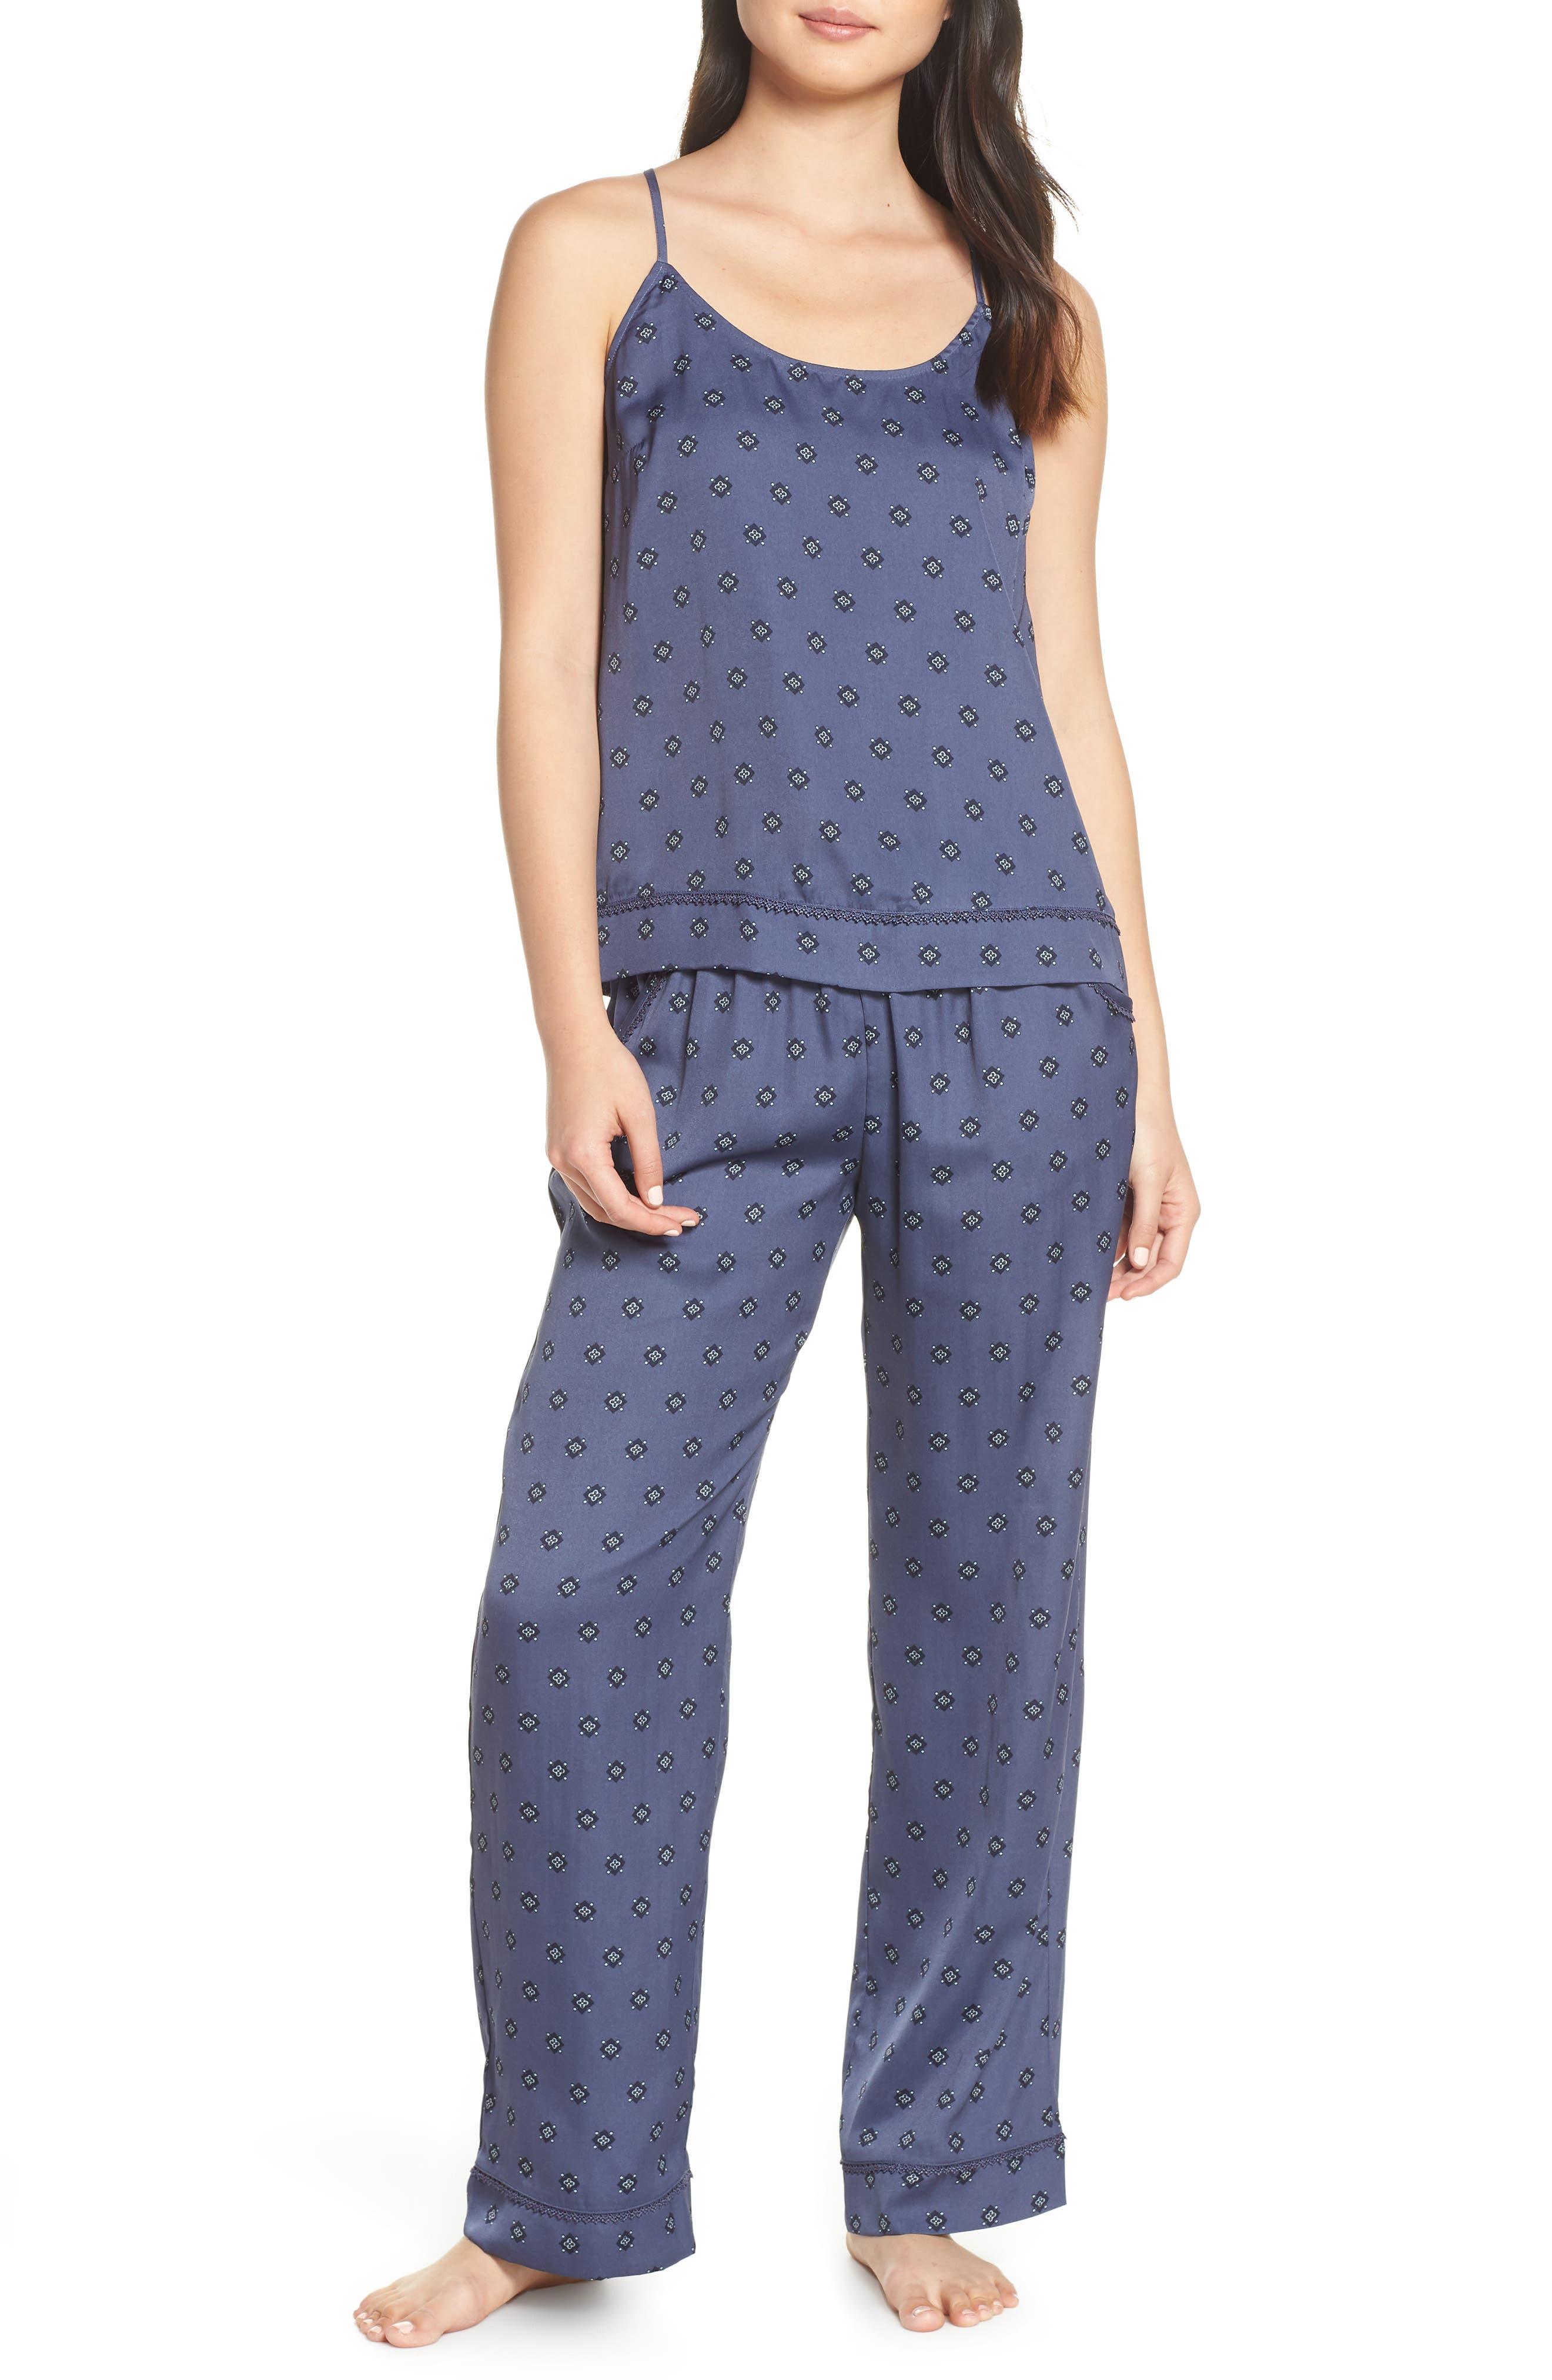 Sweet Dreams Satin Pajamas,                         Main,                         color, 401